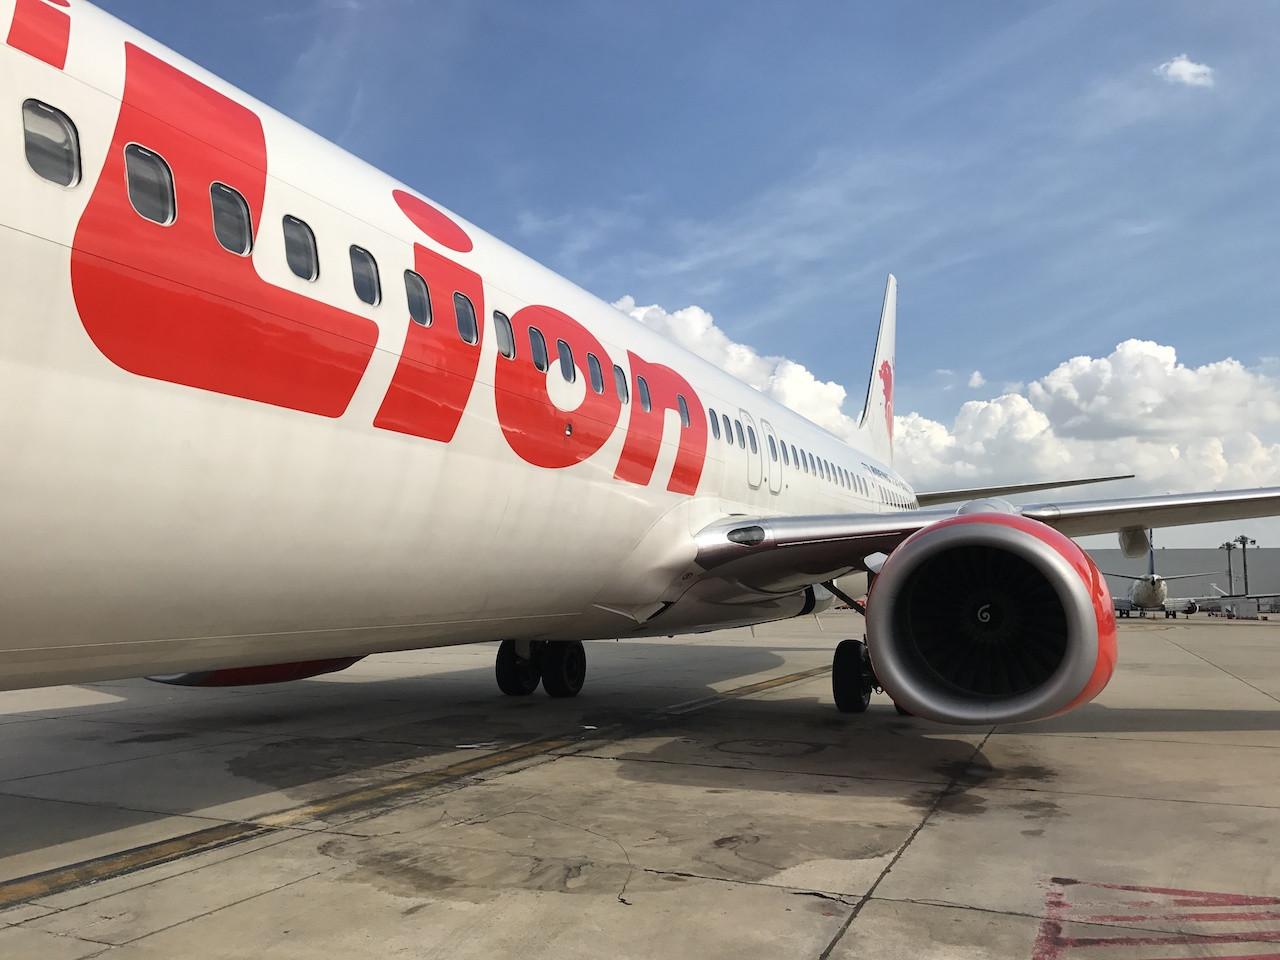 Lion Air confirms passenger named 'Jin' among 188 on Wuhan-Bali flight